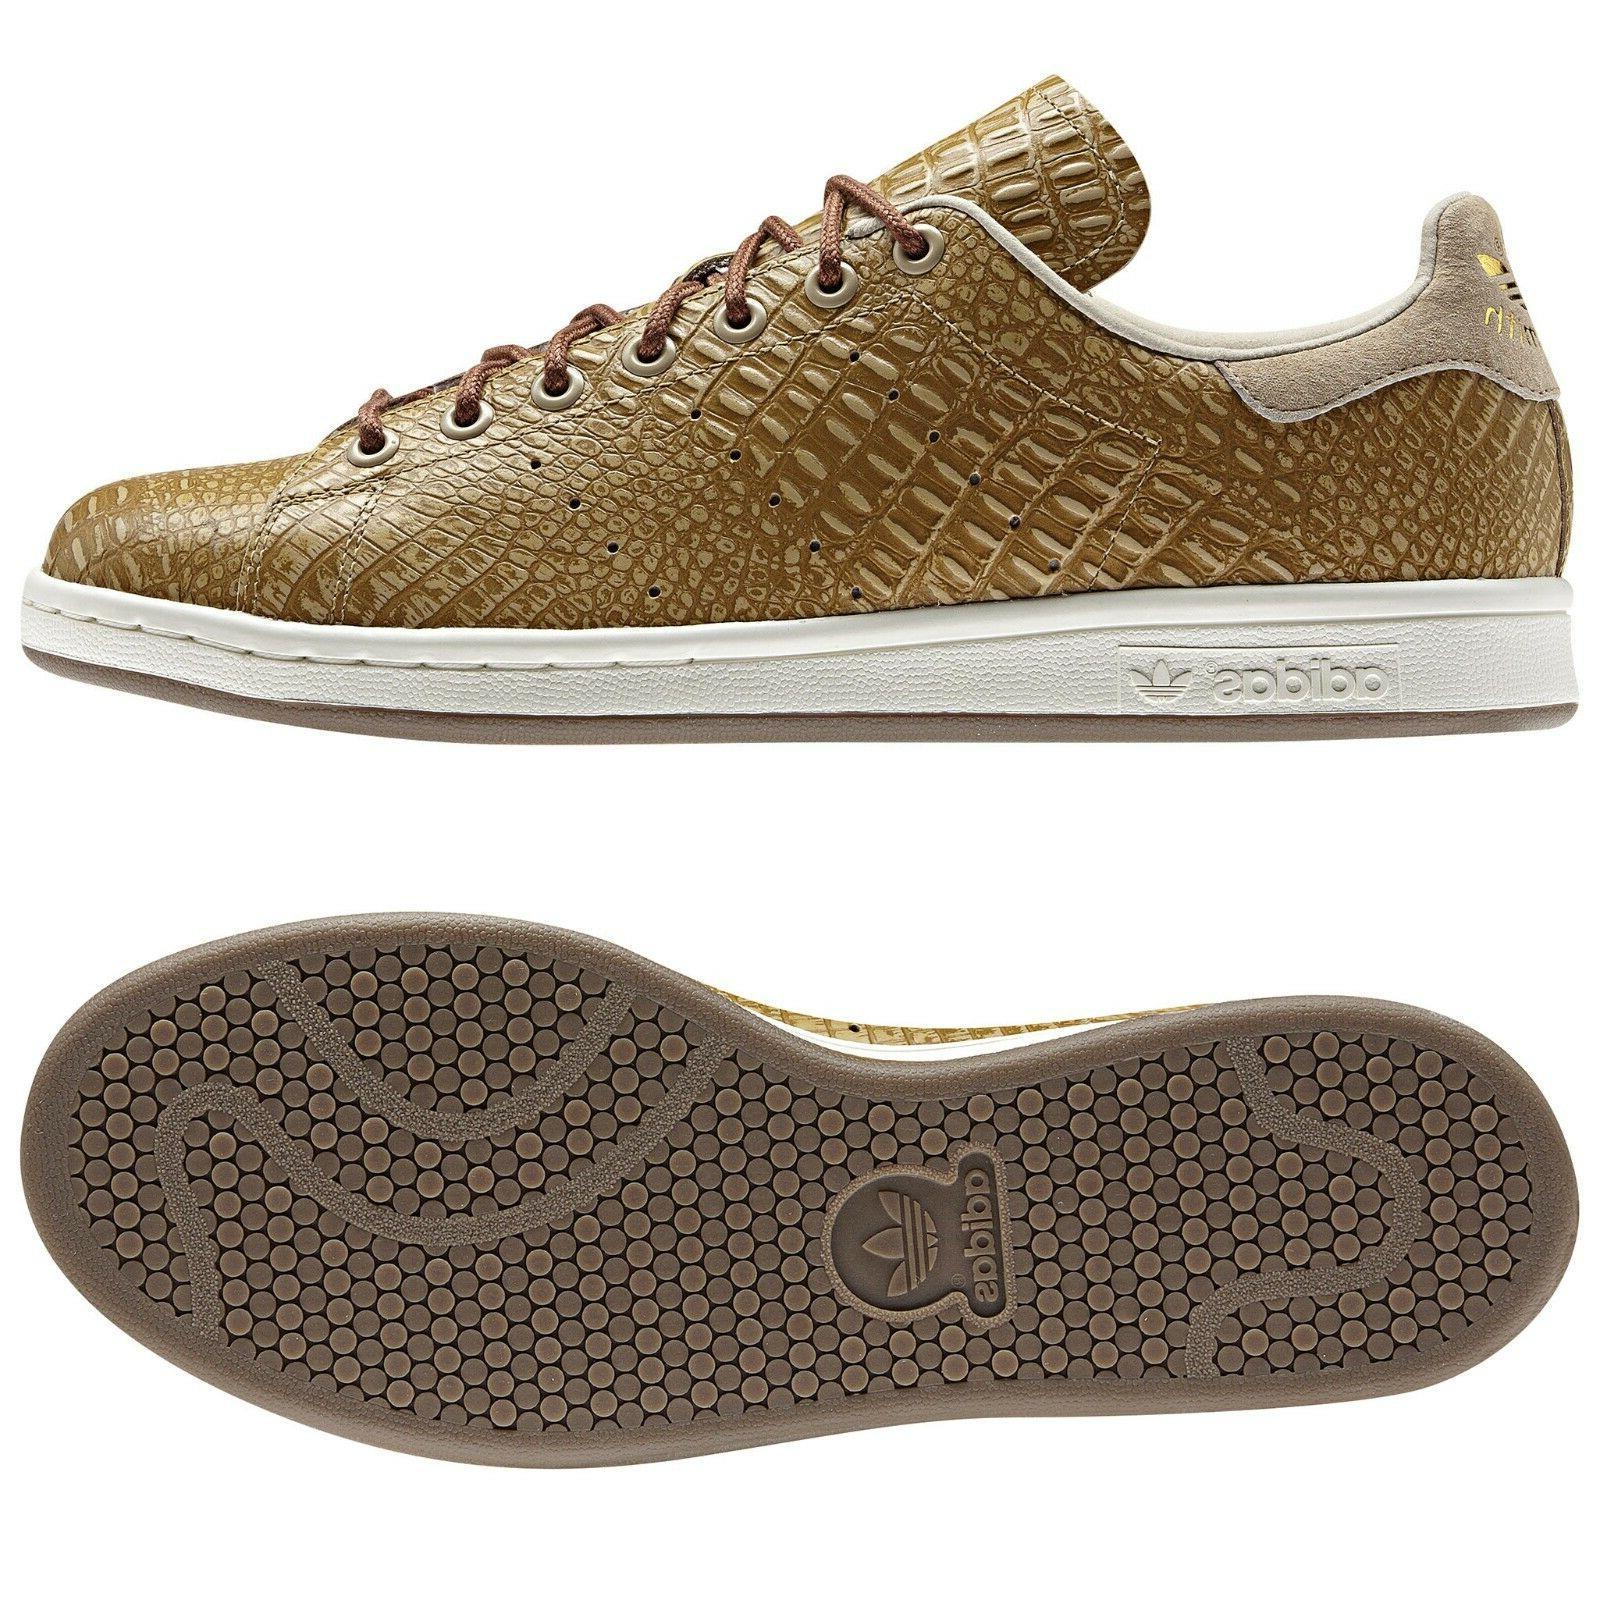 Adidas Originals Stan Smith D67657 St Pale Nude/Gold Crocodi